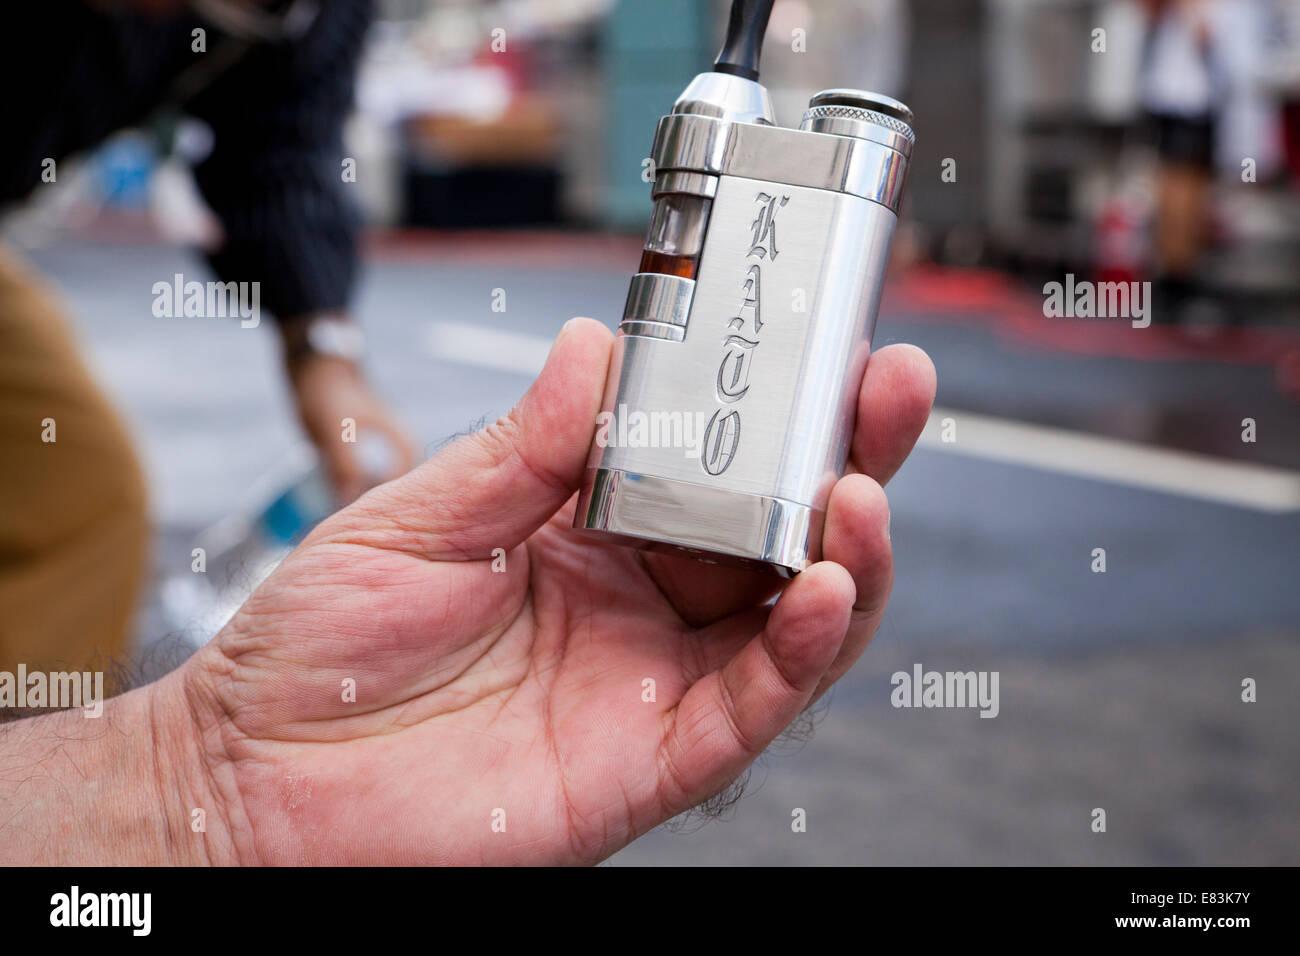 Man holding portable nicotine vaporizer - USA - Stock Image